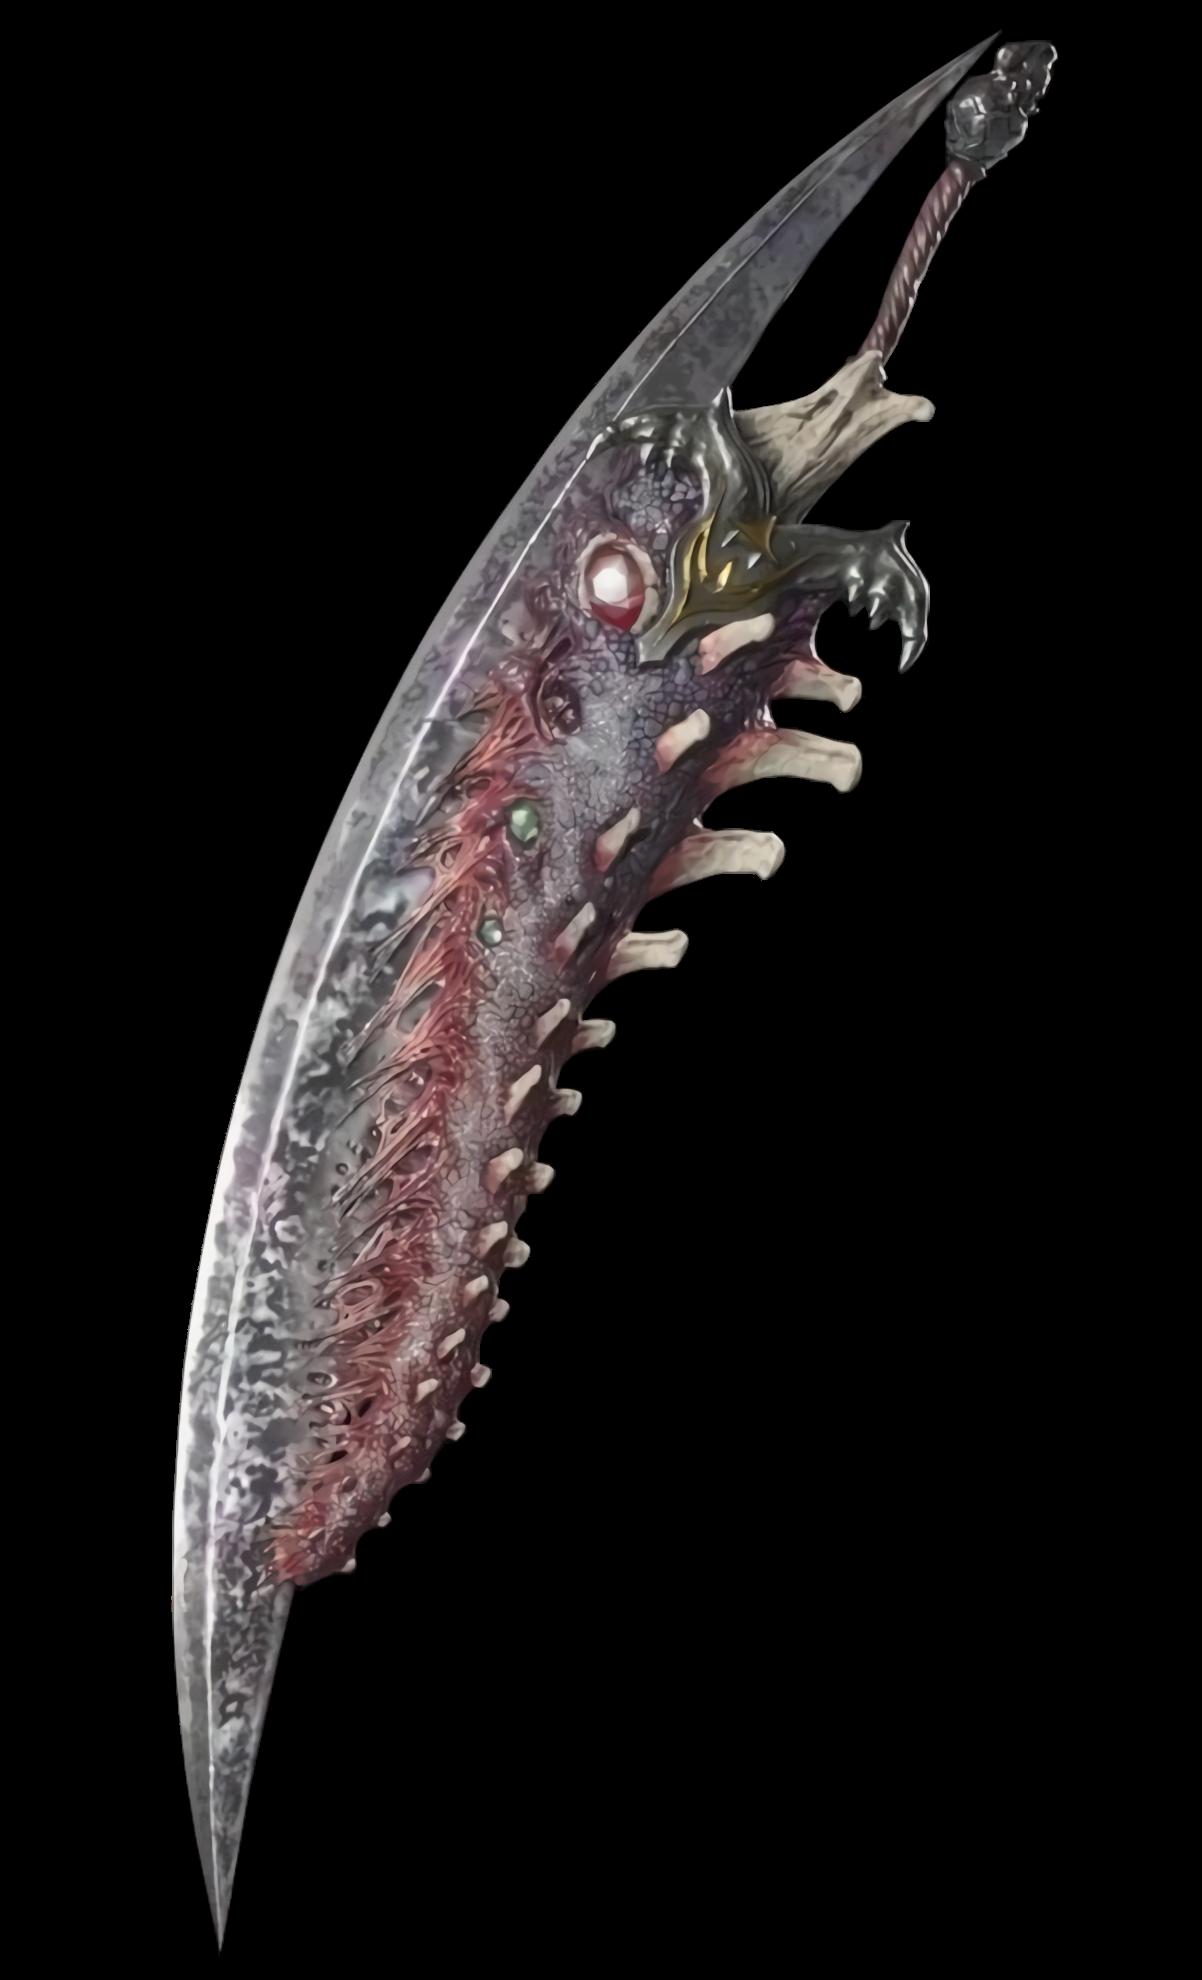 Sparda (Devil Arm) | Devil May Cry Wiki | FANDOM powered by